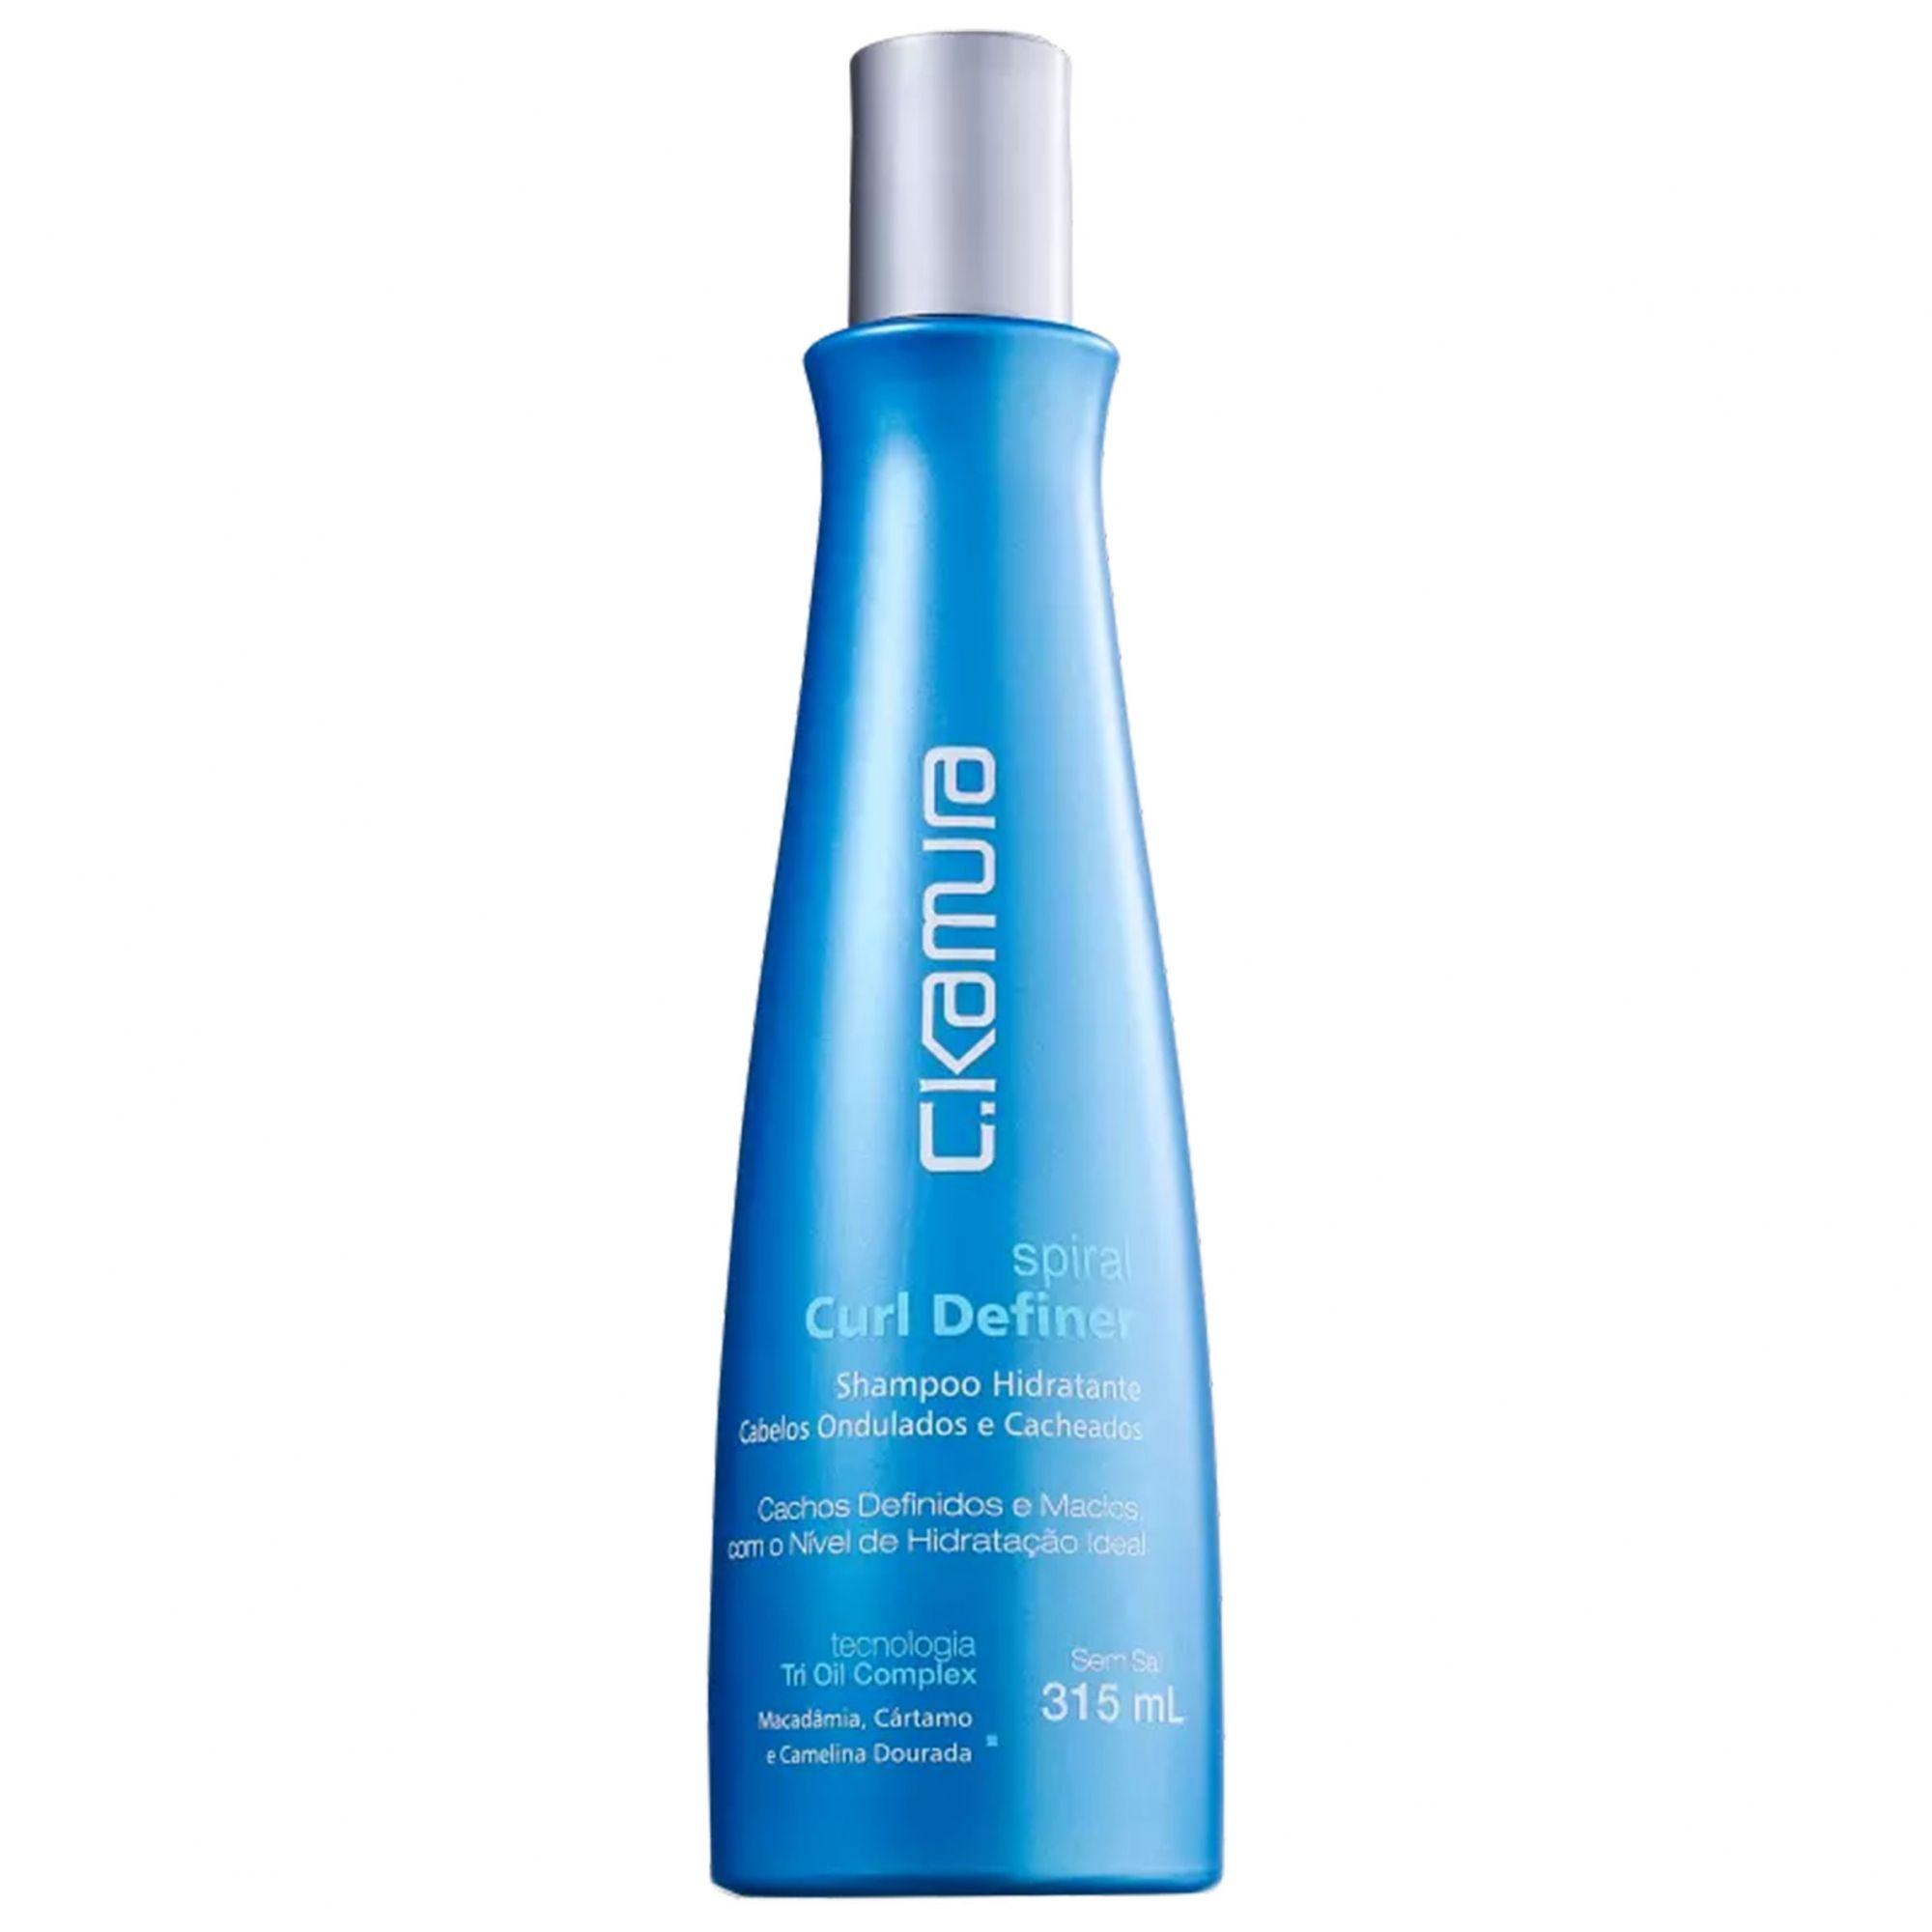 C.Kamura Spiral Curl Definer - Shampoo 315ml.